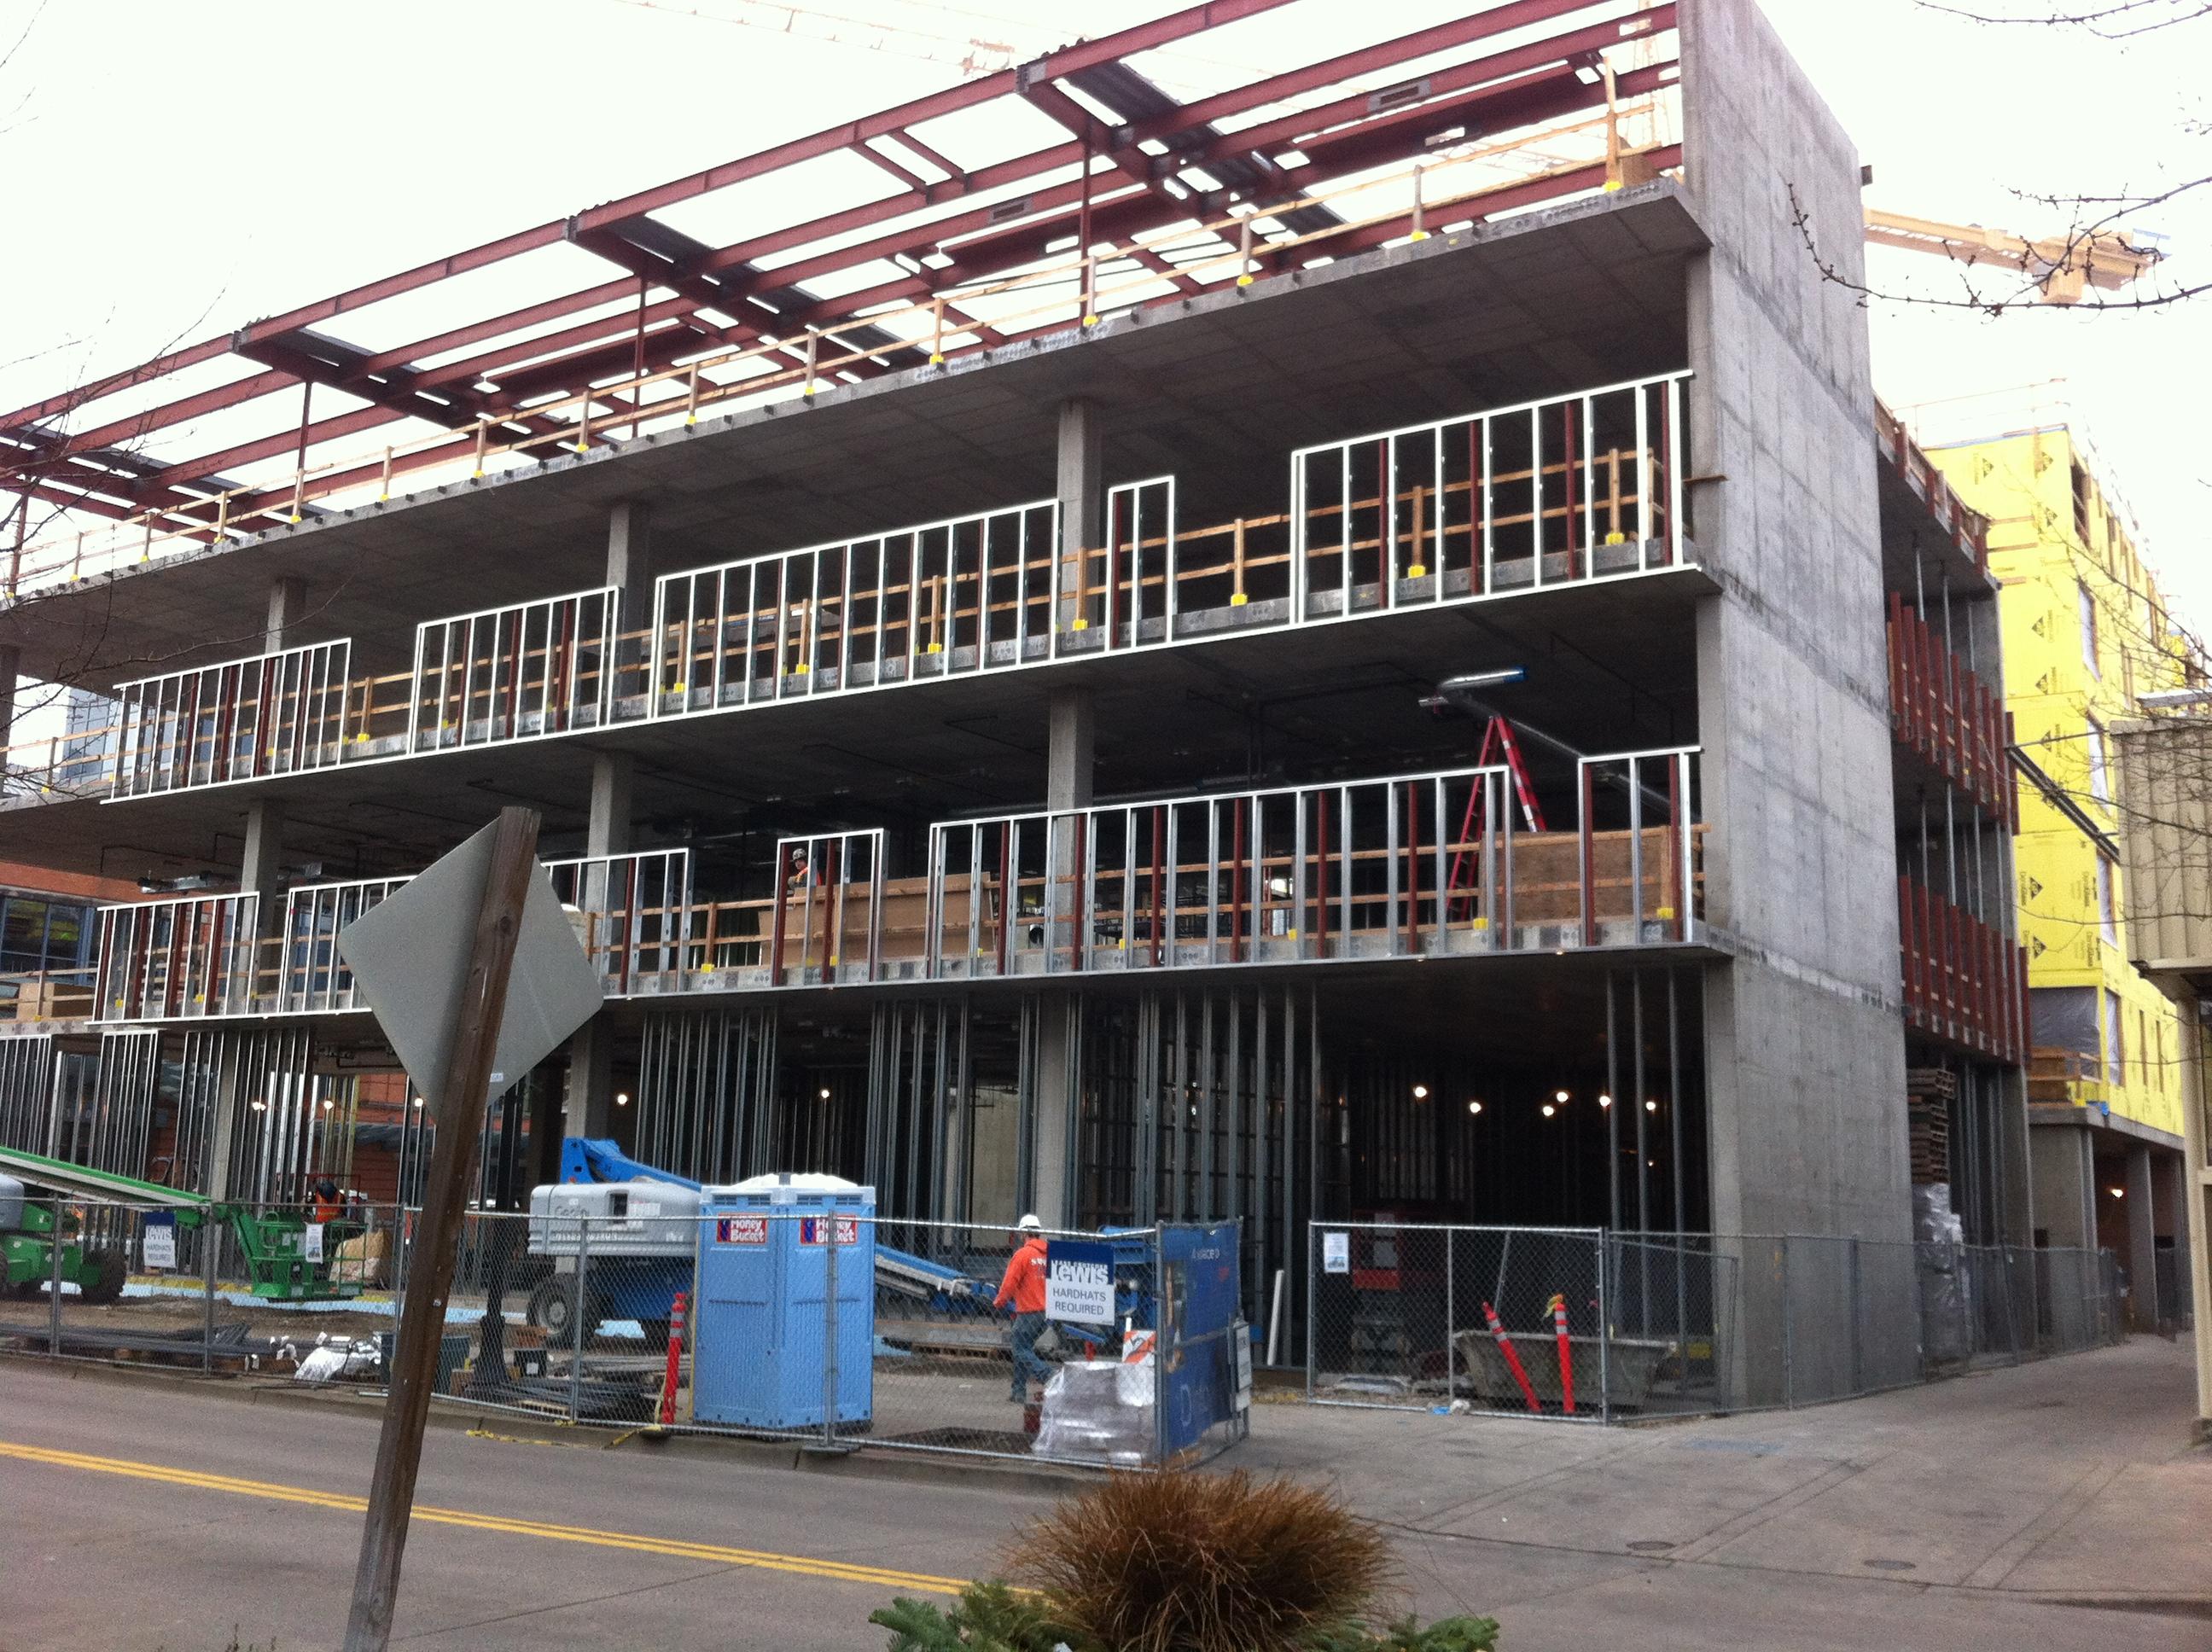 Eugene Commercial Building Code